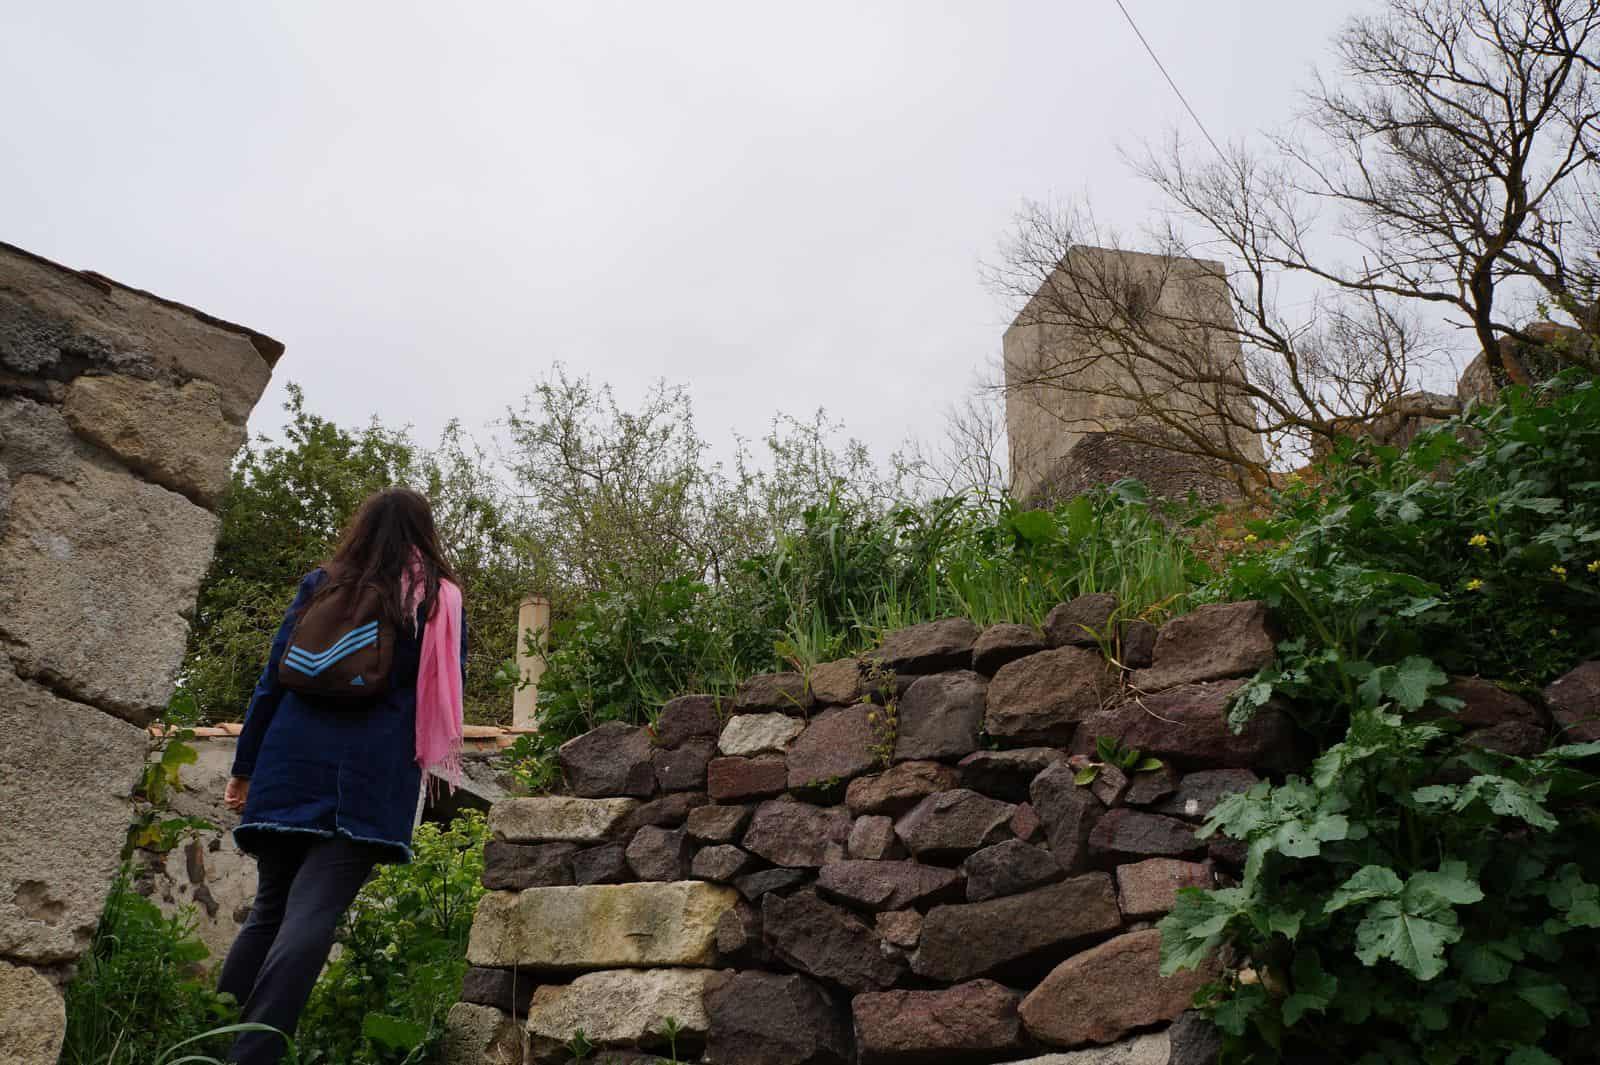 castello_medievale_osilo_malaspina_ingresso